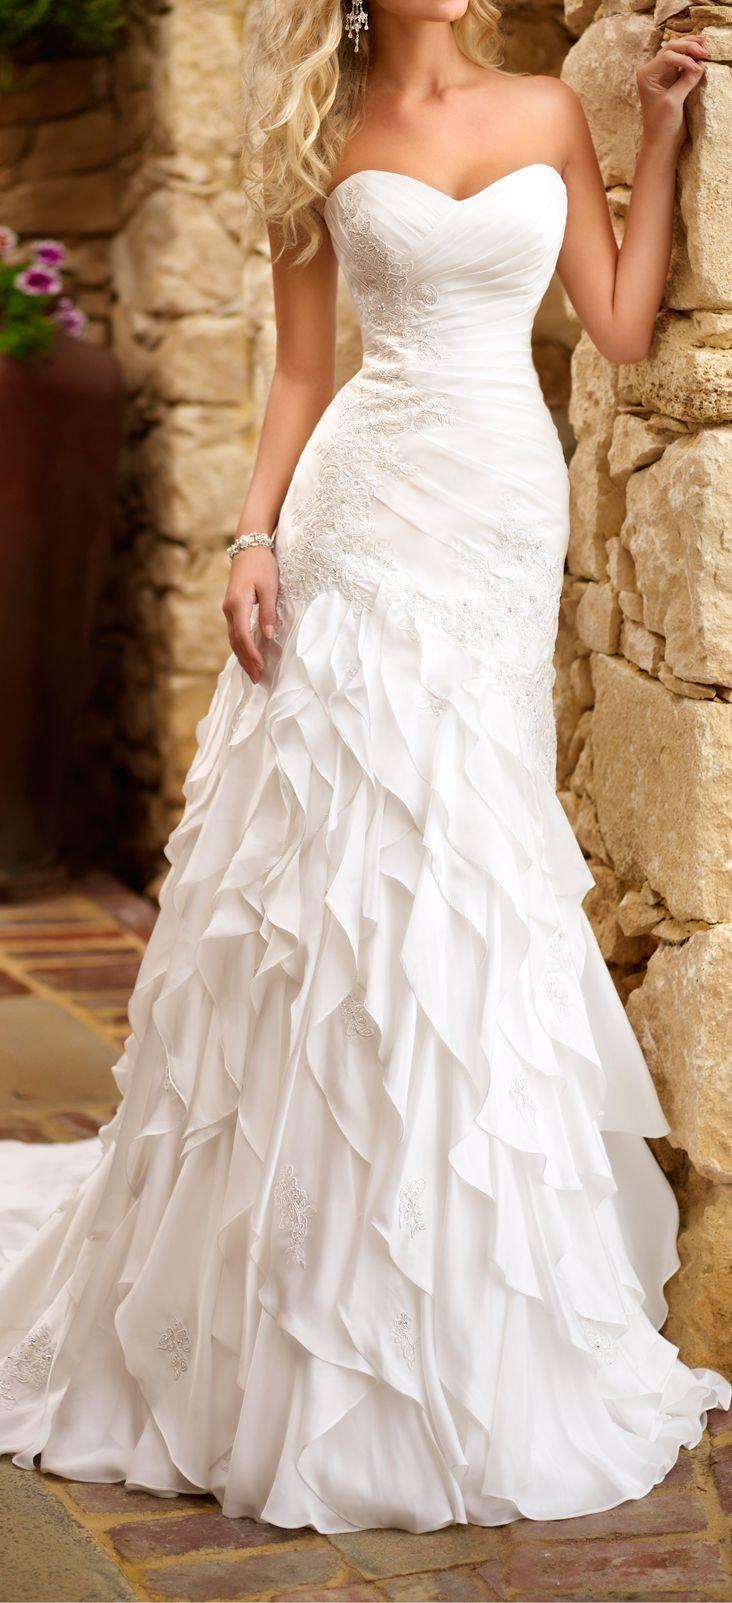 Sweetheart ruffle wedding dress wedding ideas pinterest